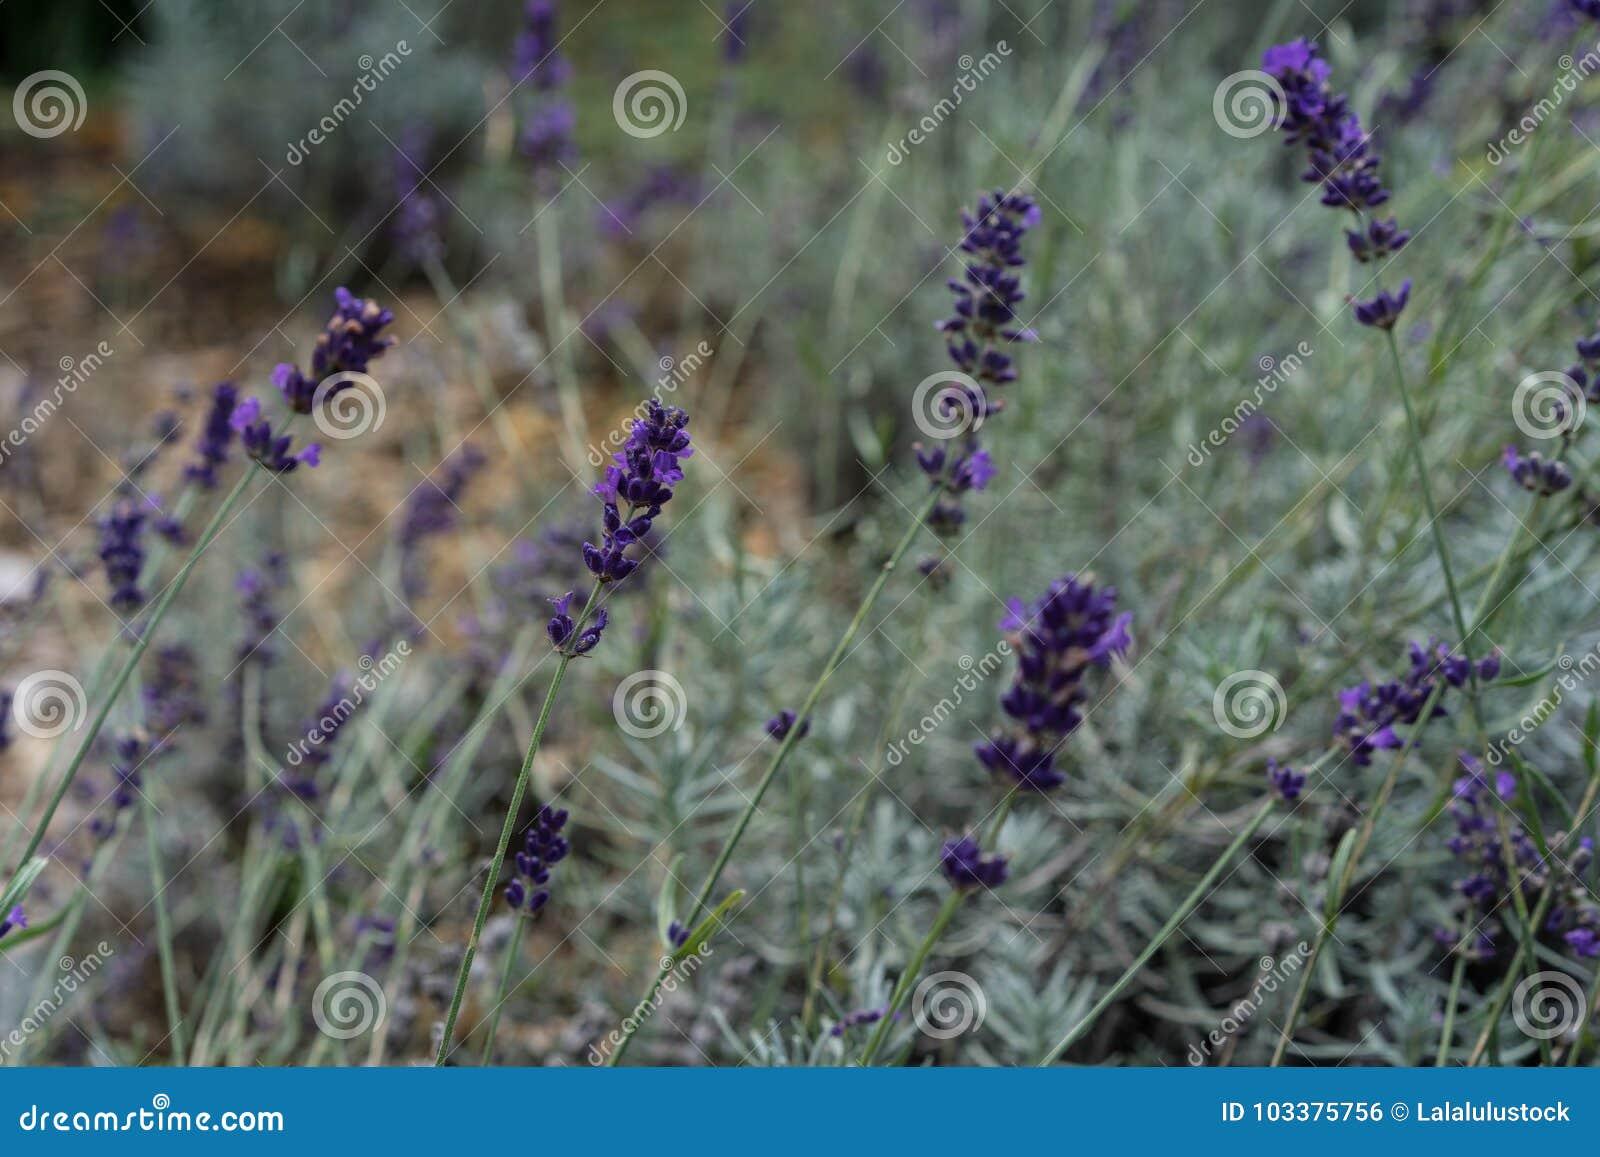 Lavender herb plant lavandula angustifolia lamiaceae from europe in garden